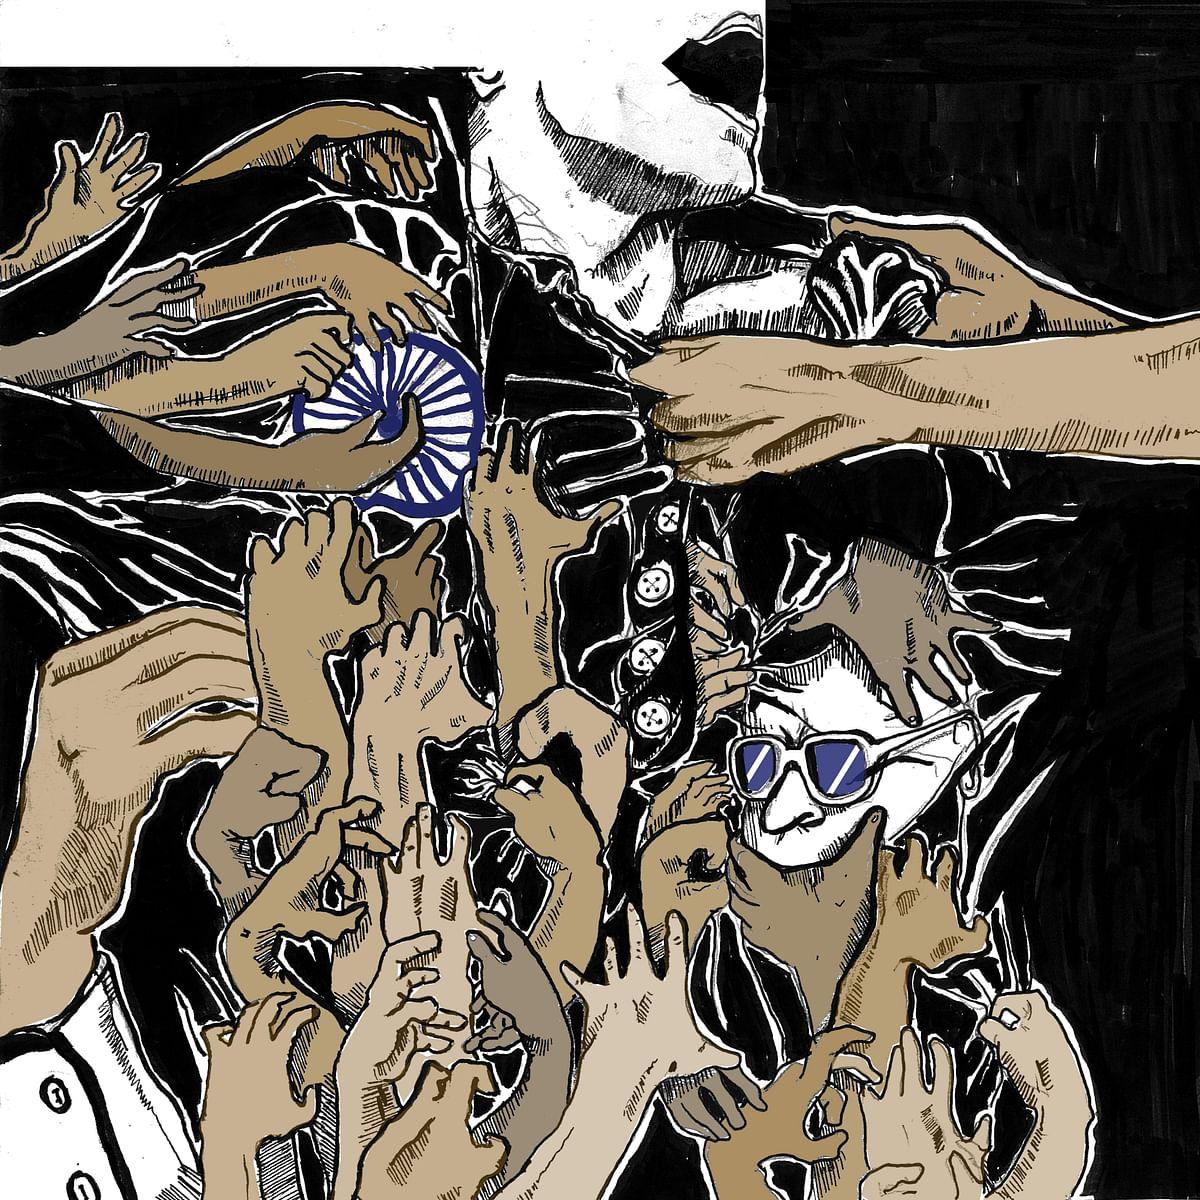 Artwork by Ajinkya Dekhane for 'No Lockdown On Caste Atrocities'. (Courtesy: Esthaappen S.)